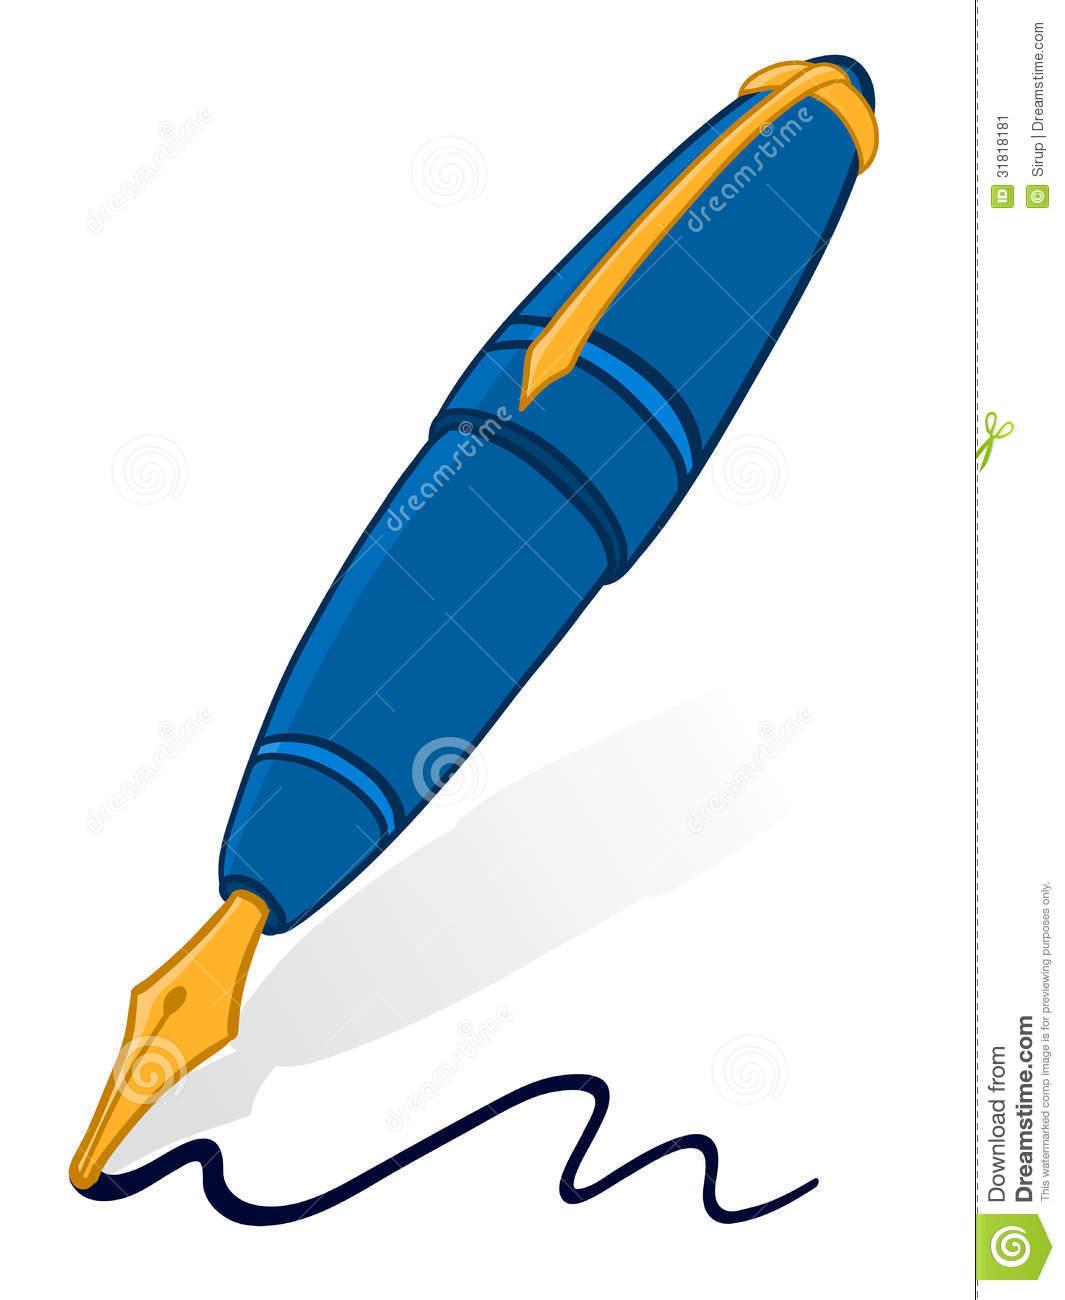 Ink Pen Clipart.